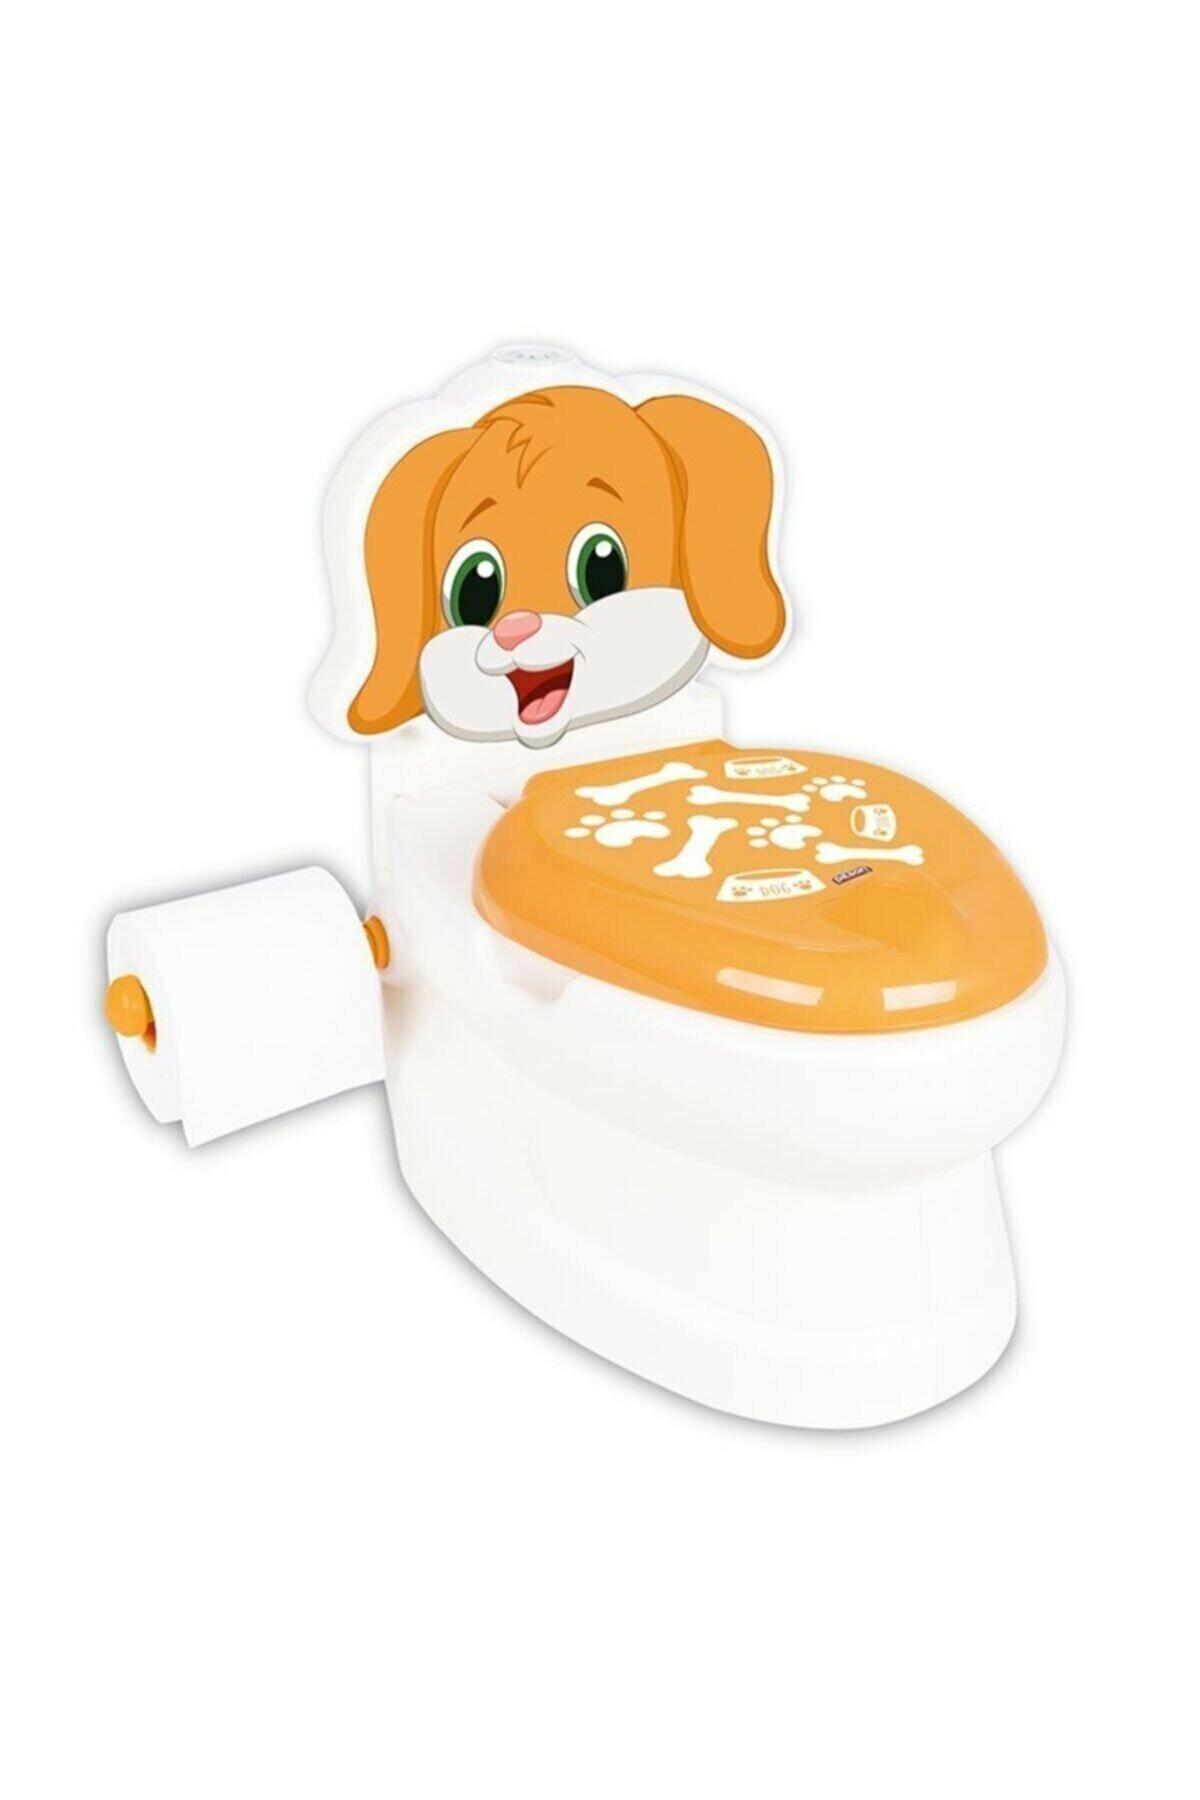 Baby Child Toilet Training Dog Printed Educational Toilet Seat Toilet Paper Holder 25 Kg Loading Capacity